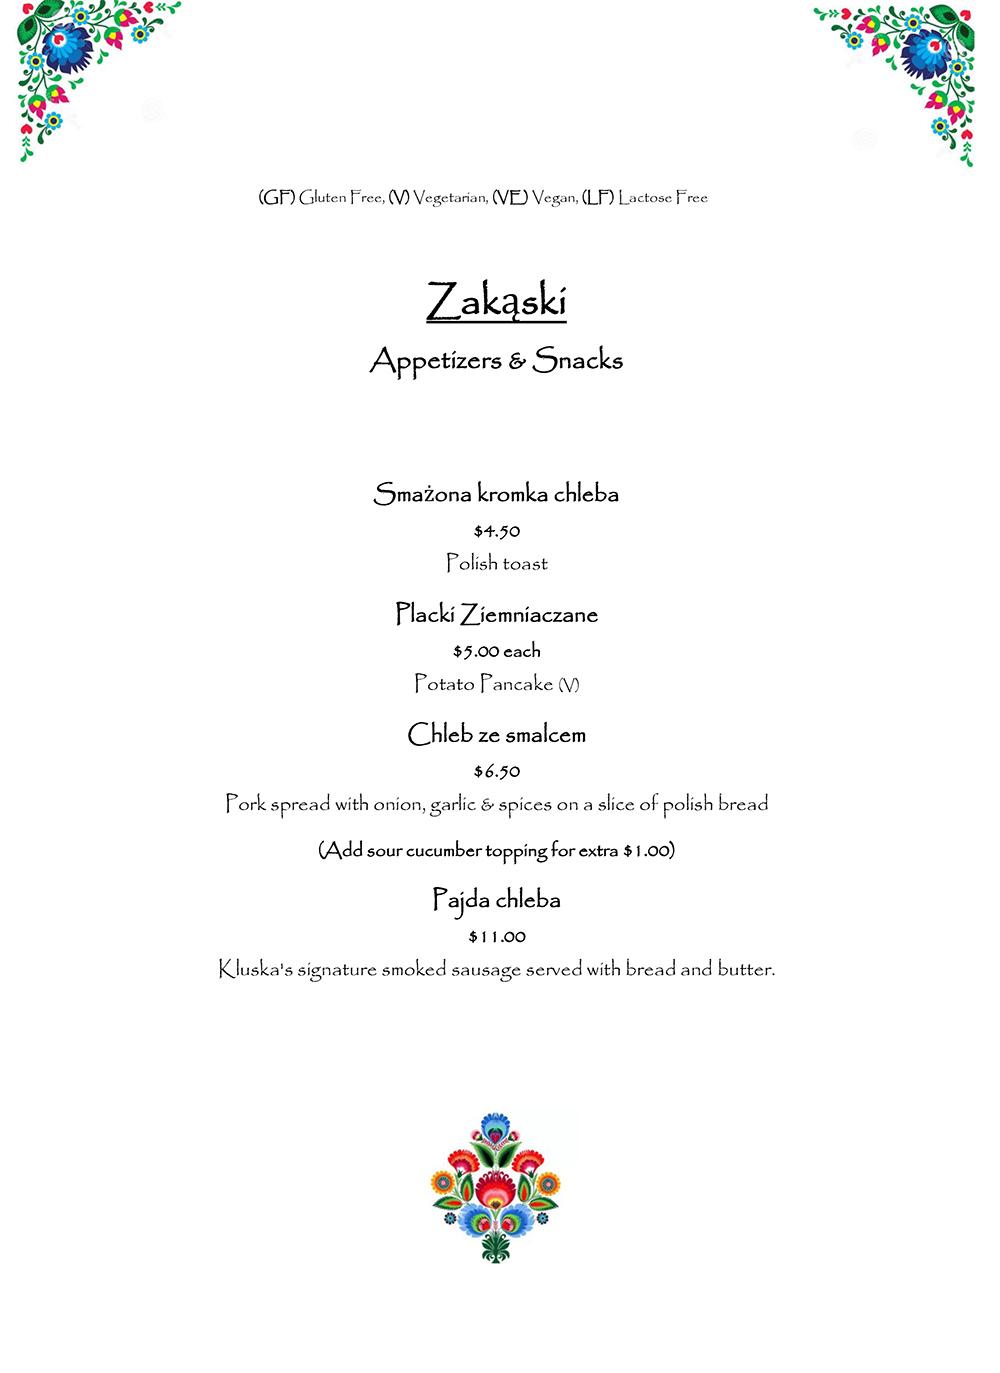 KluskaRestaurant_Menu-appetizer-FINAL